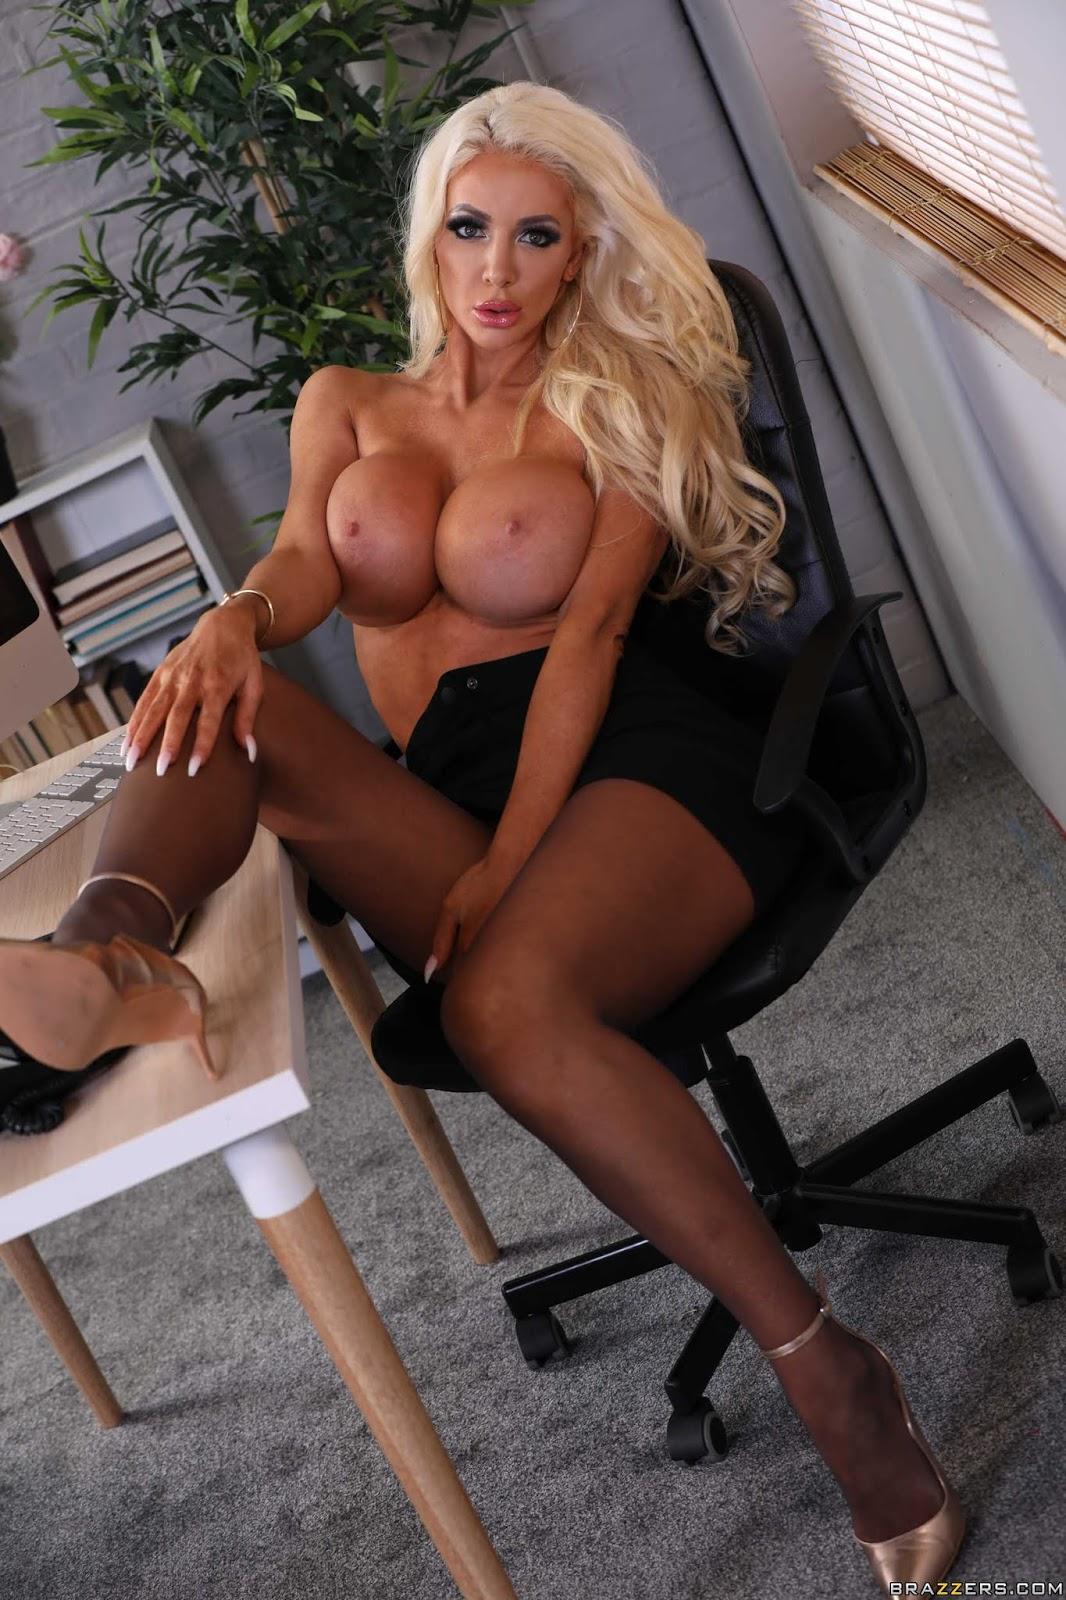 Nicolette-Shea-%3A-Massaged-On-The-Job-%23%23-BRAZZERS-n7aefv5unx.jpg